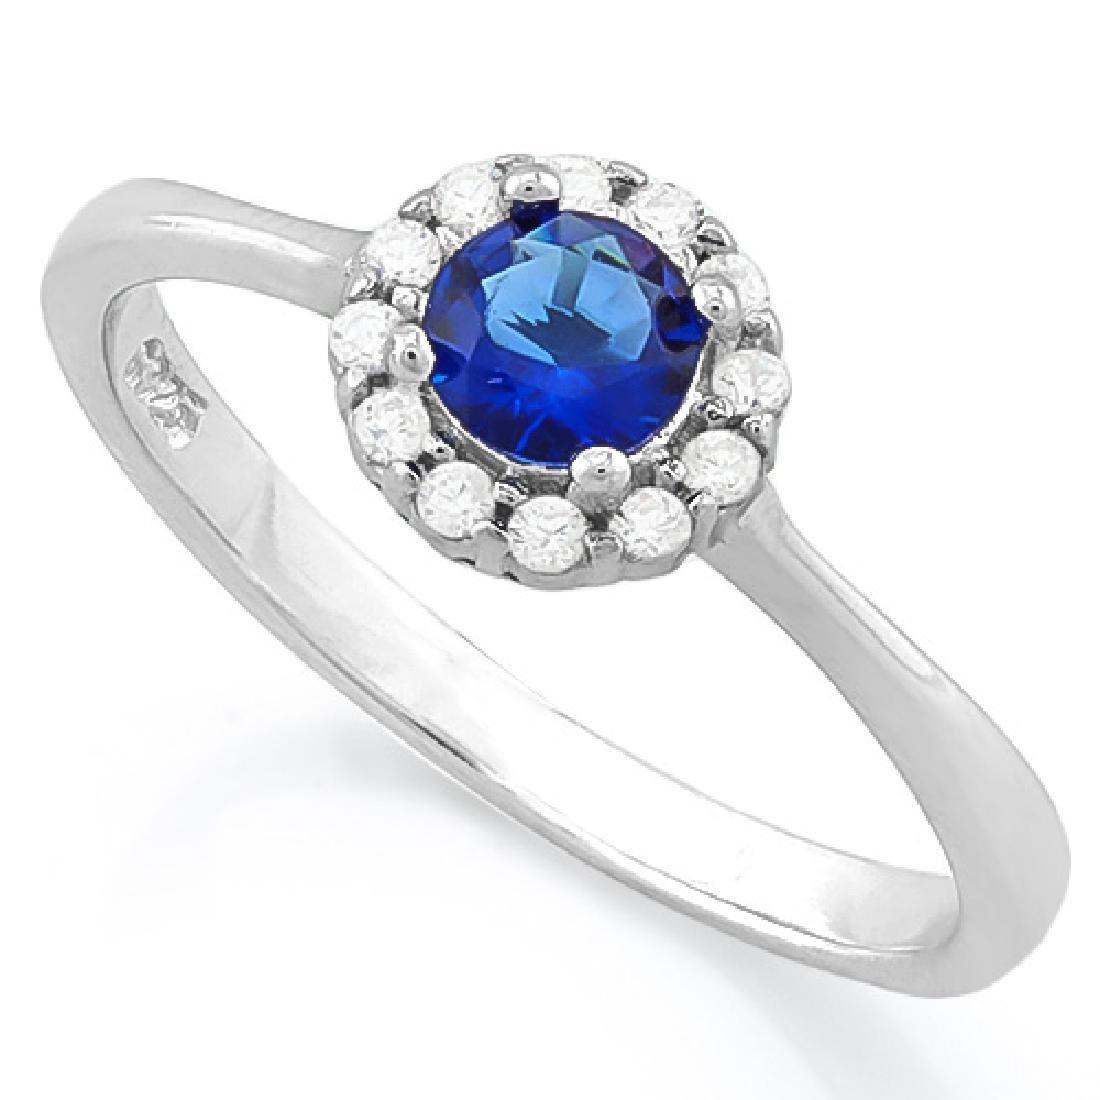 1/2 CARAT CREATED BLUE SAPPHIRE & (12 PCS) FLAWLESS CRE